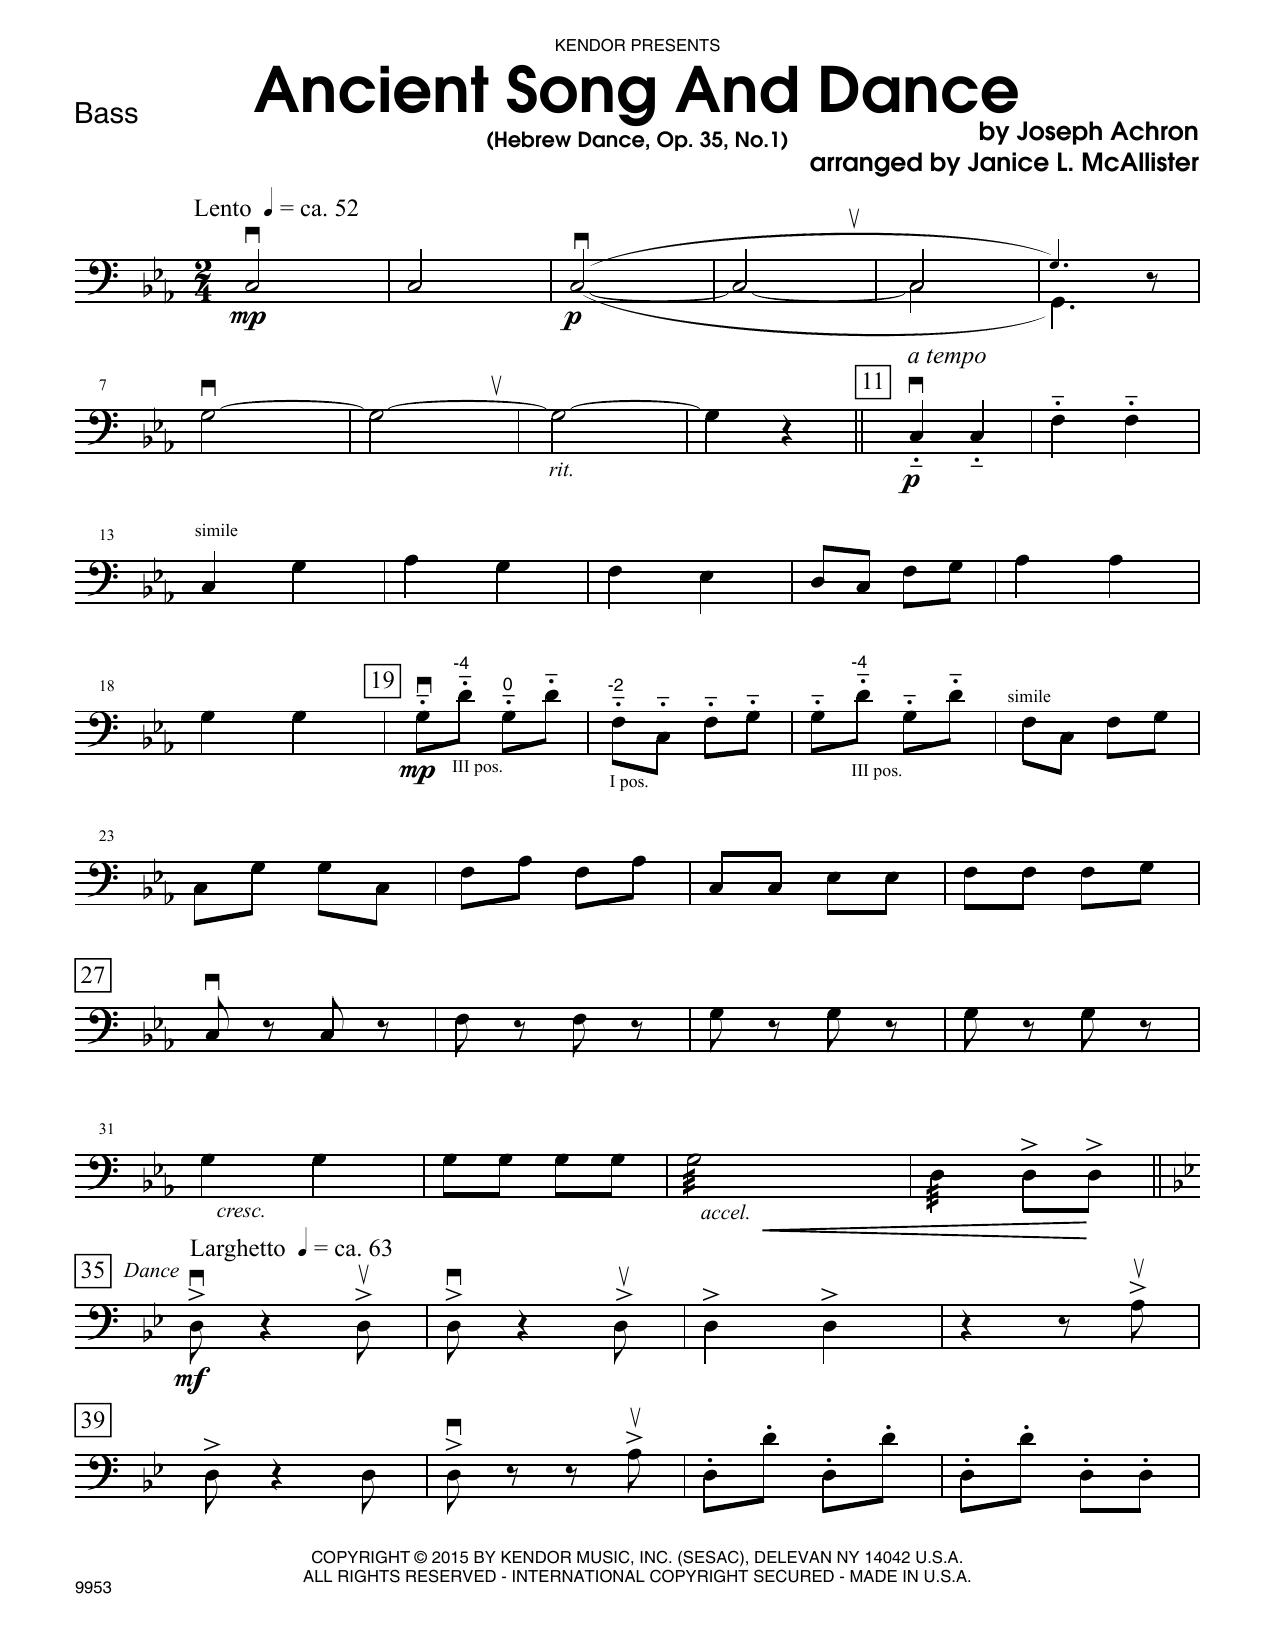 Ancient Song And Dance (Hebrew Dance, Op. 35, No. 1) - Bass